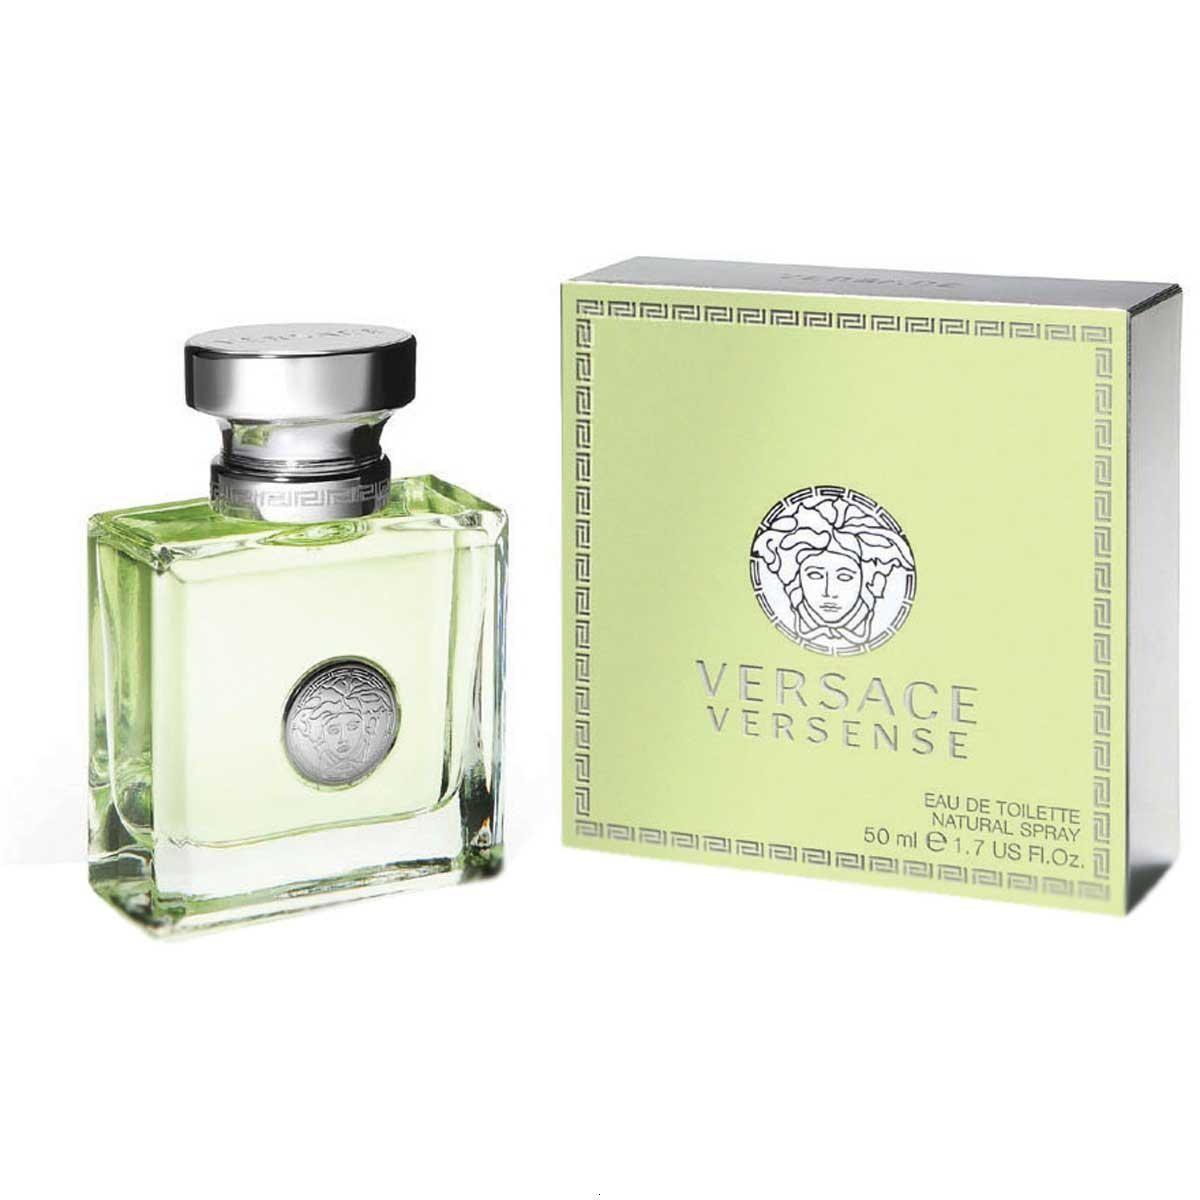 Versace Versense аромат для женщин